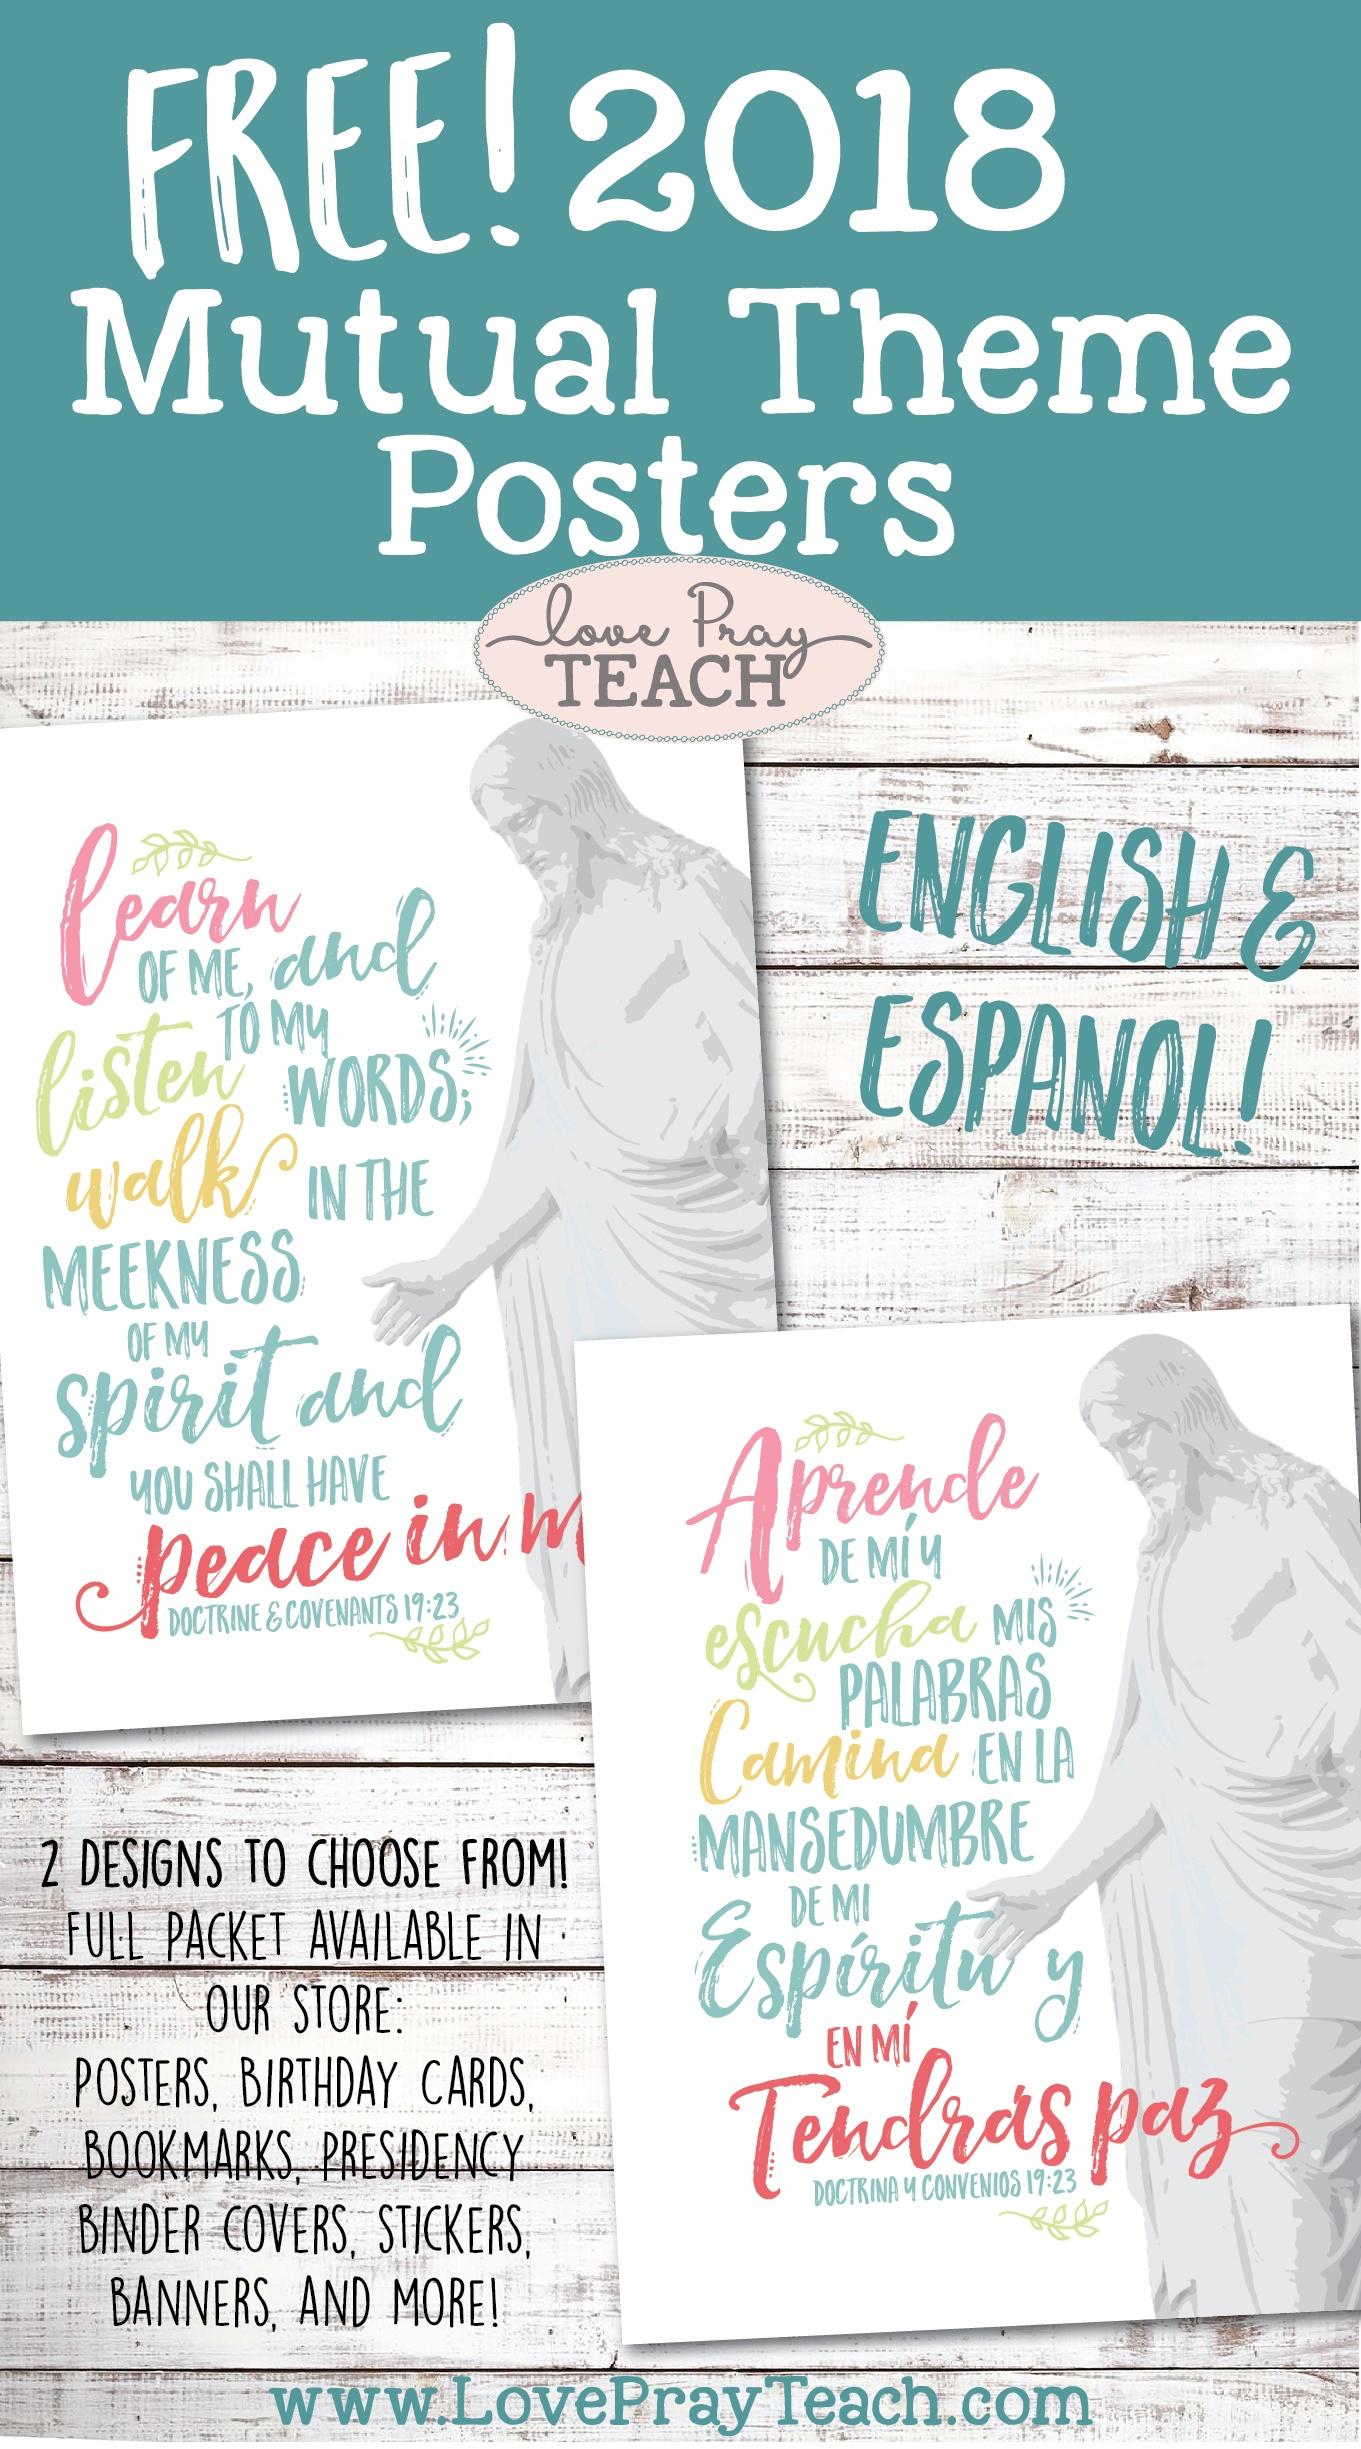 Free! 2018 Mutual Theme Posters! - Free Printable Sud